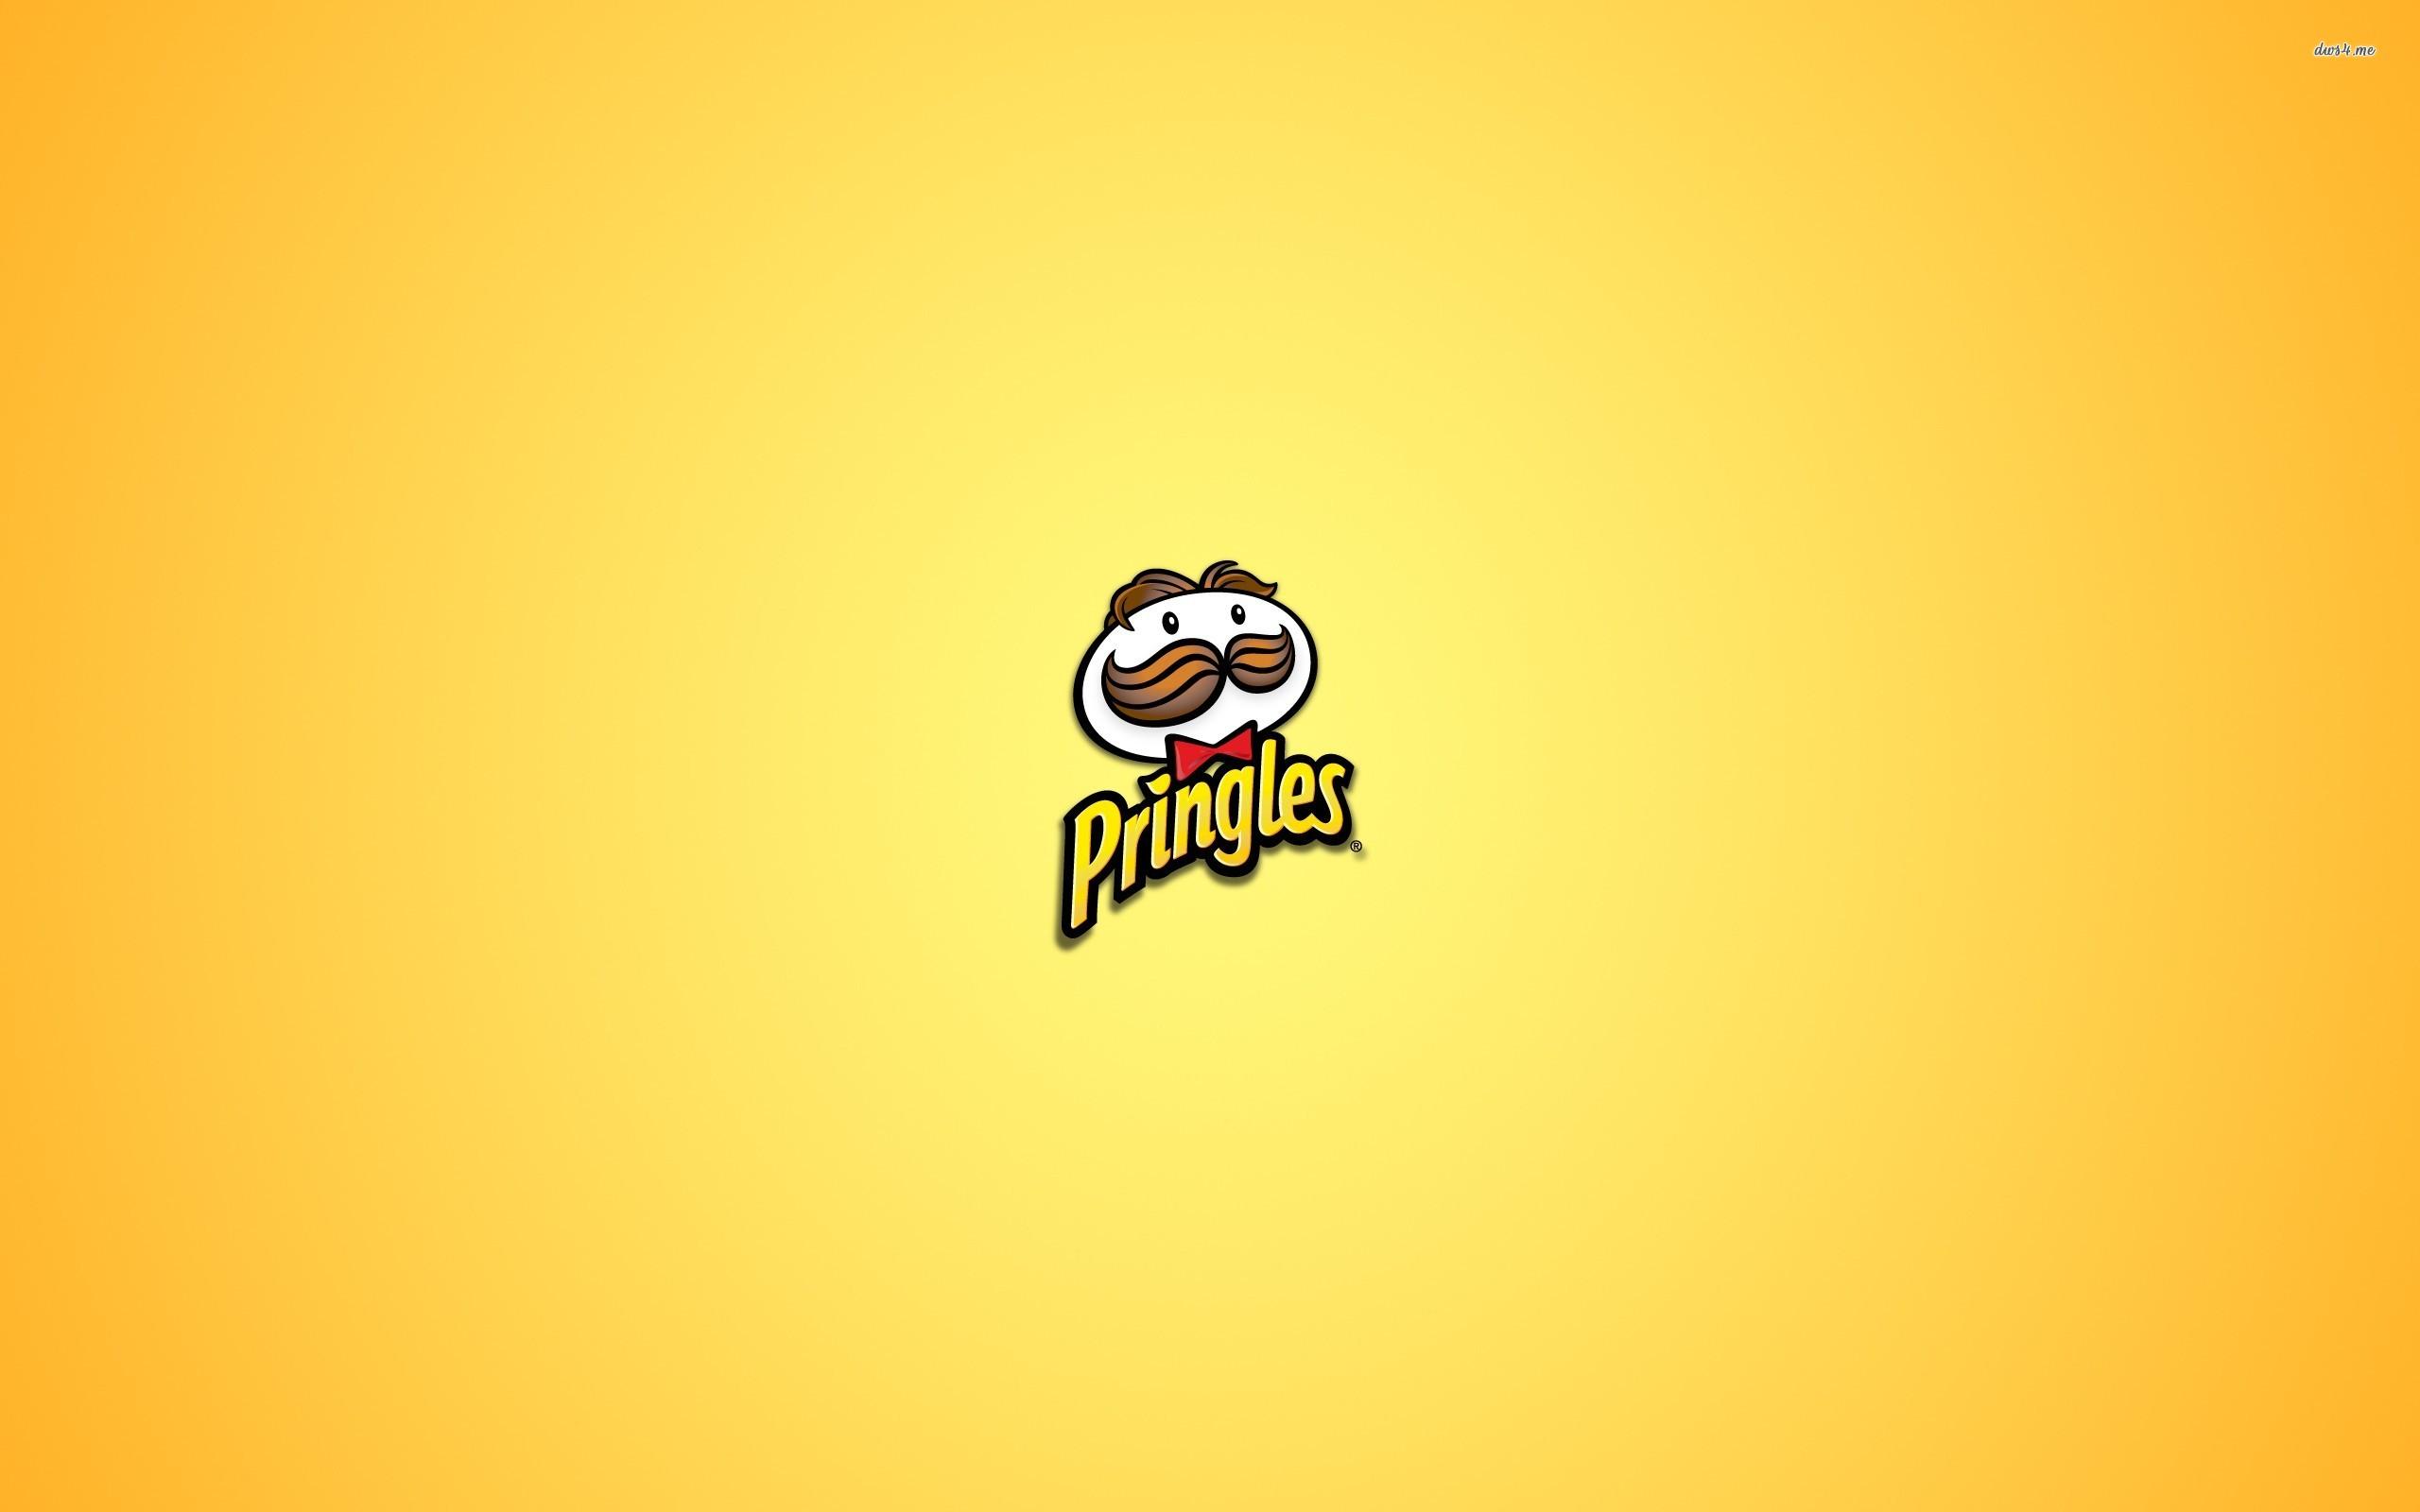 Pringles wallpaper   Minimalistic wallpapers   39872 2560x1600